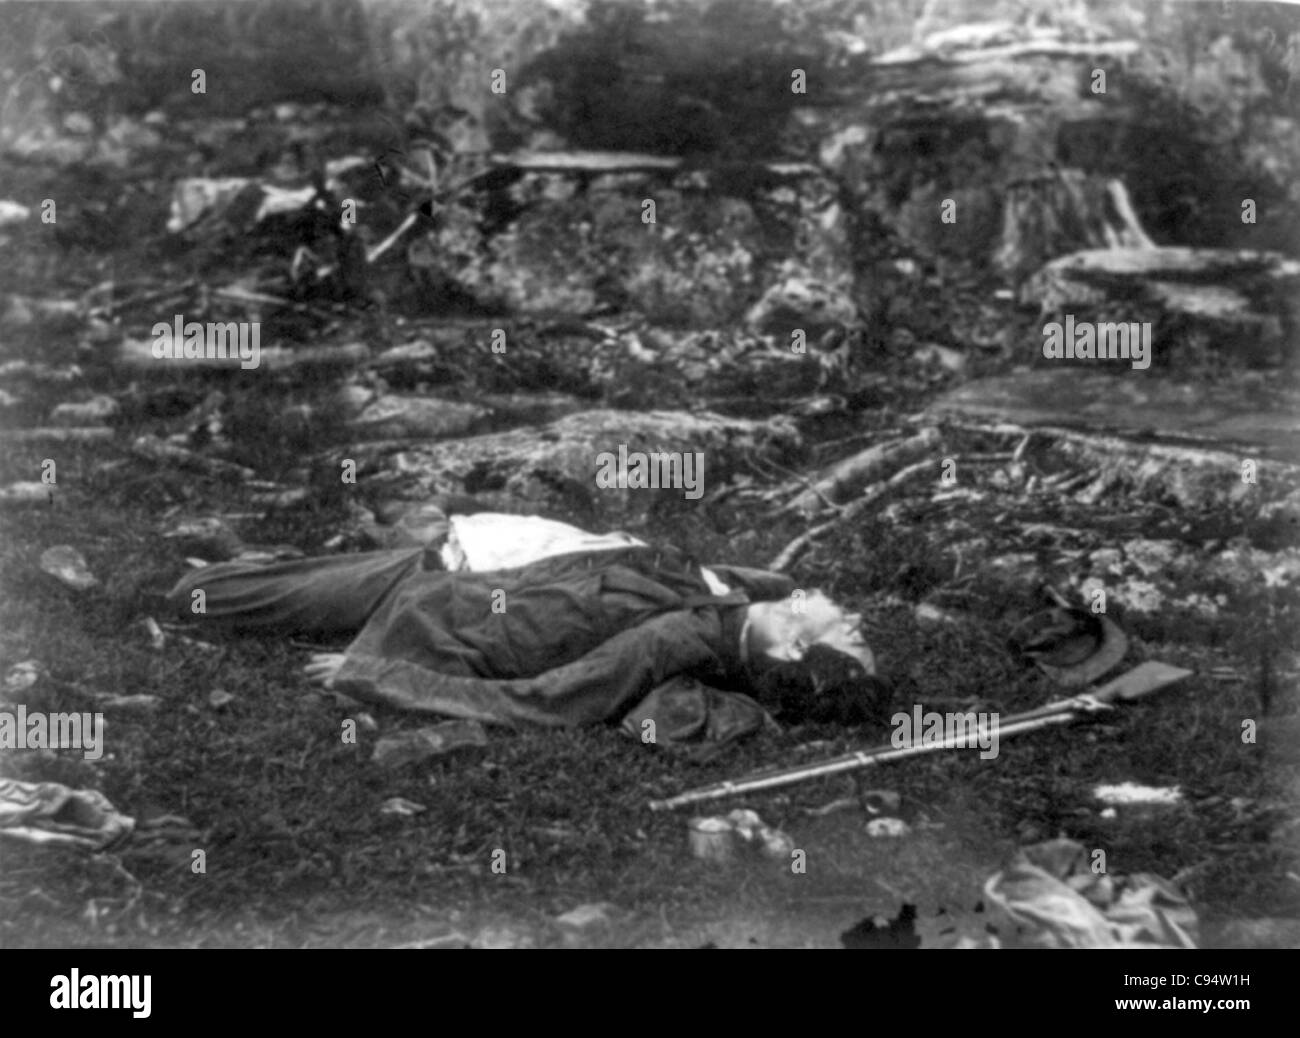 Dead soldier on battlefield at Gettysburg, Pennsylvania. - Stock Image